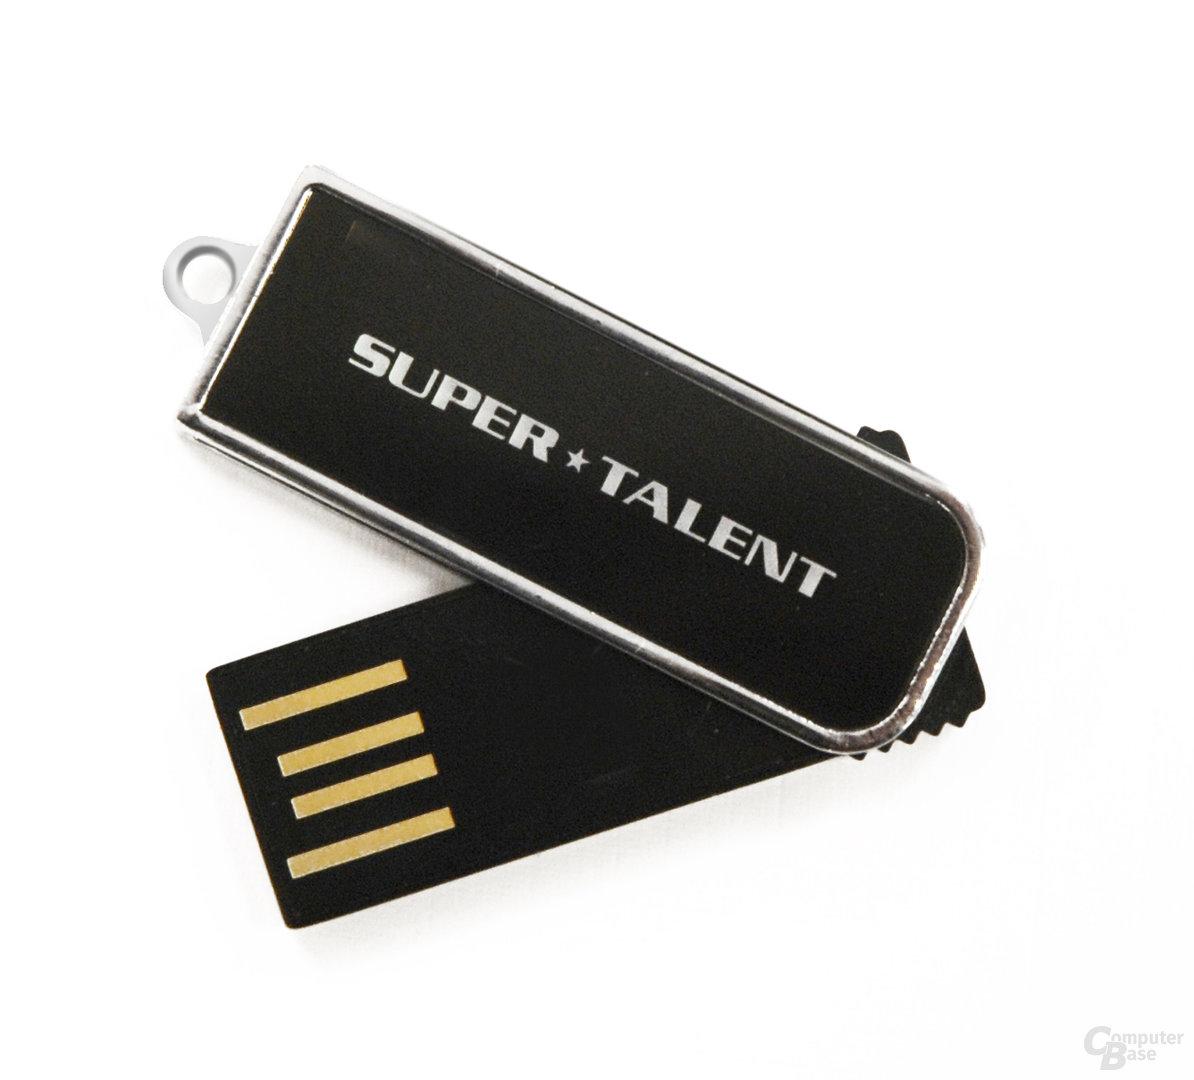 Super Talent Pico_D mit 16 GByte